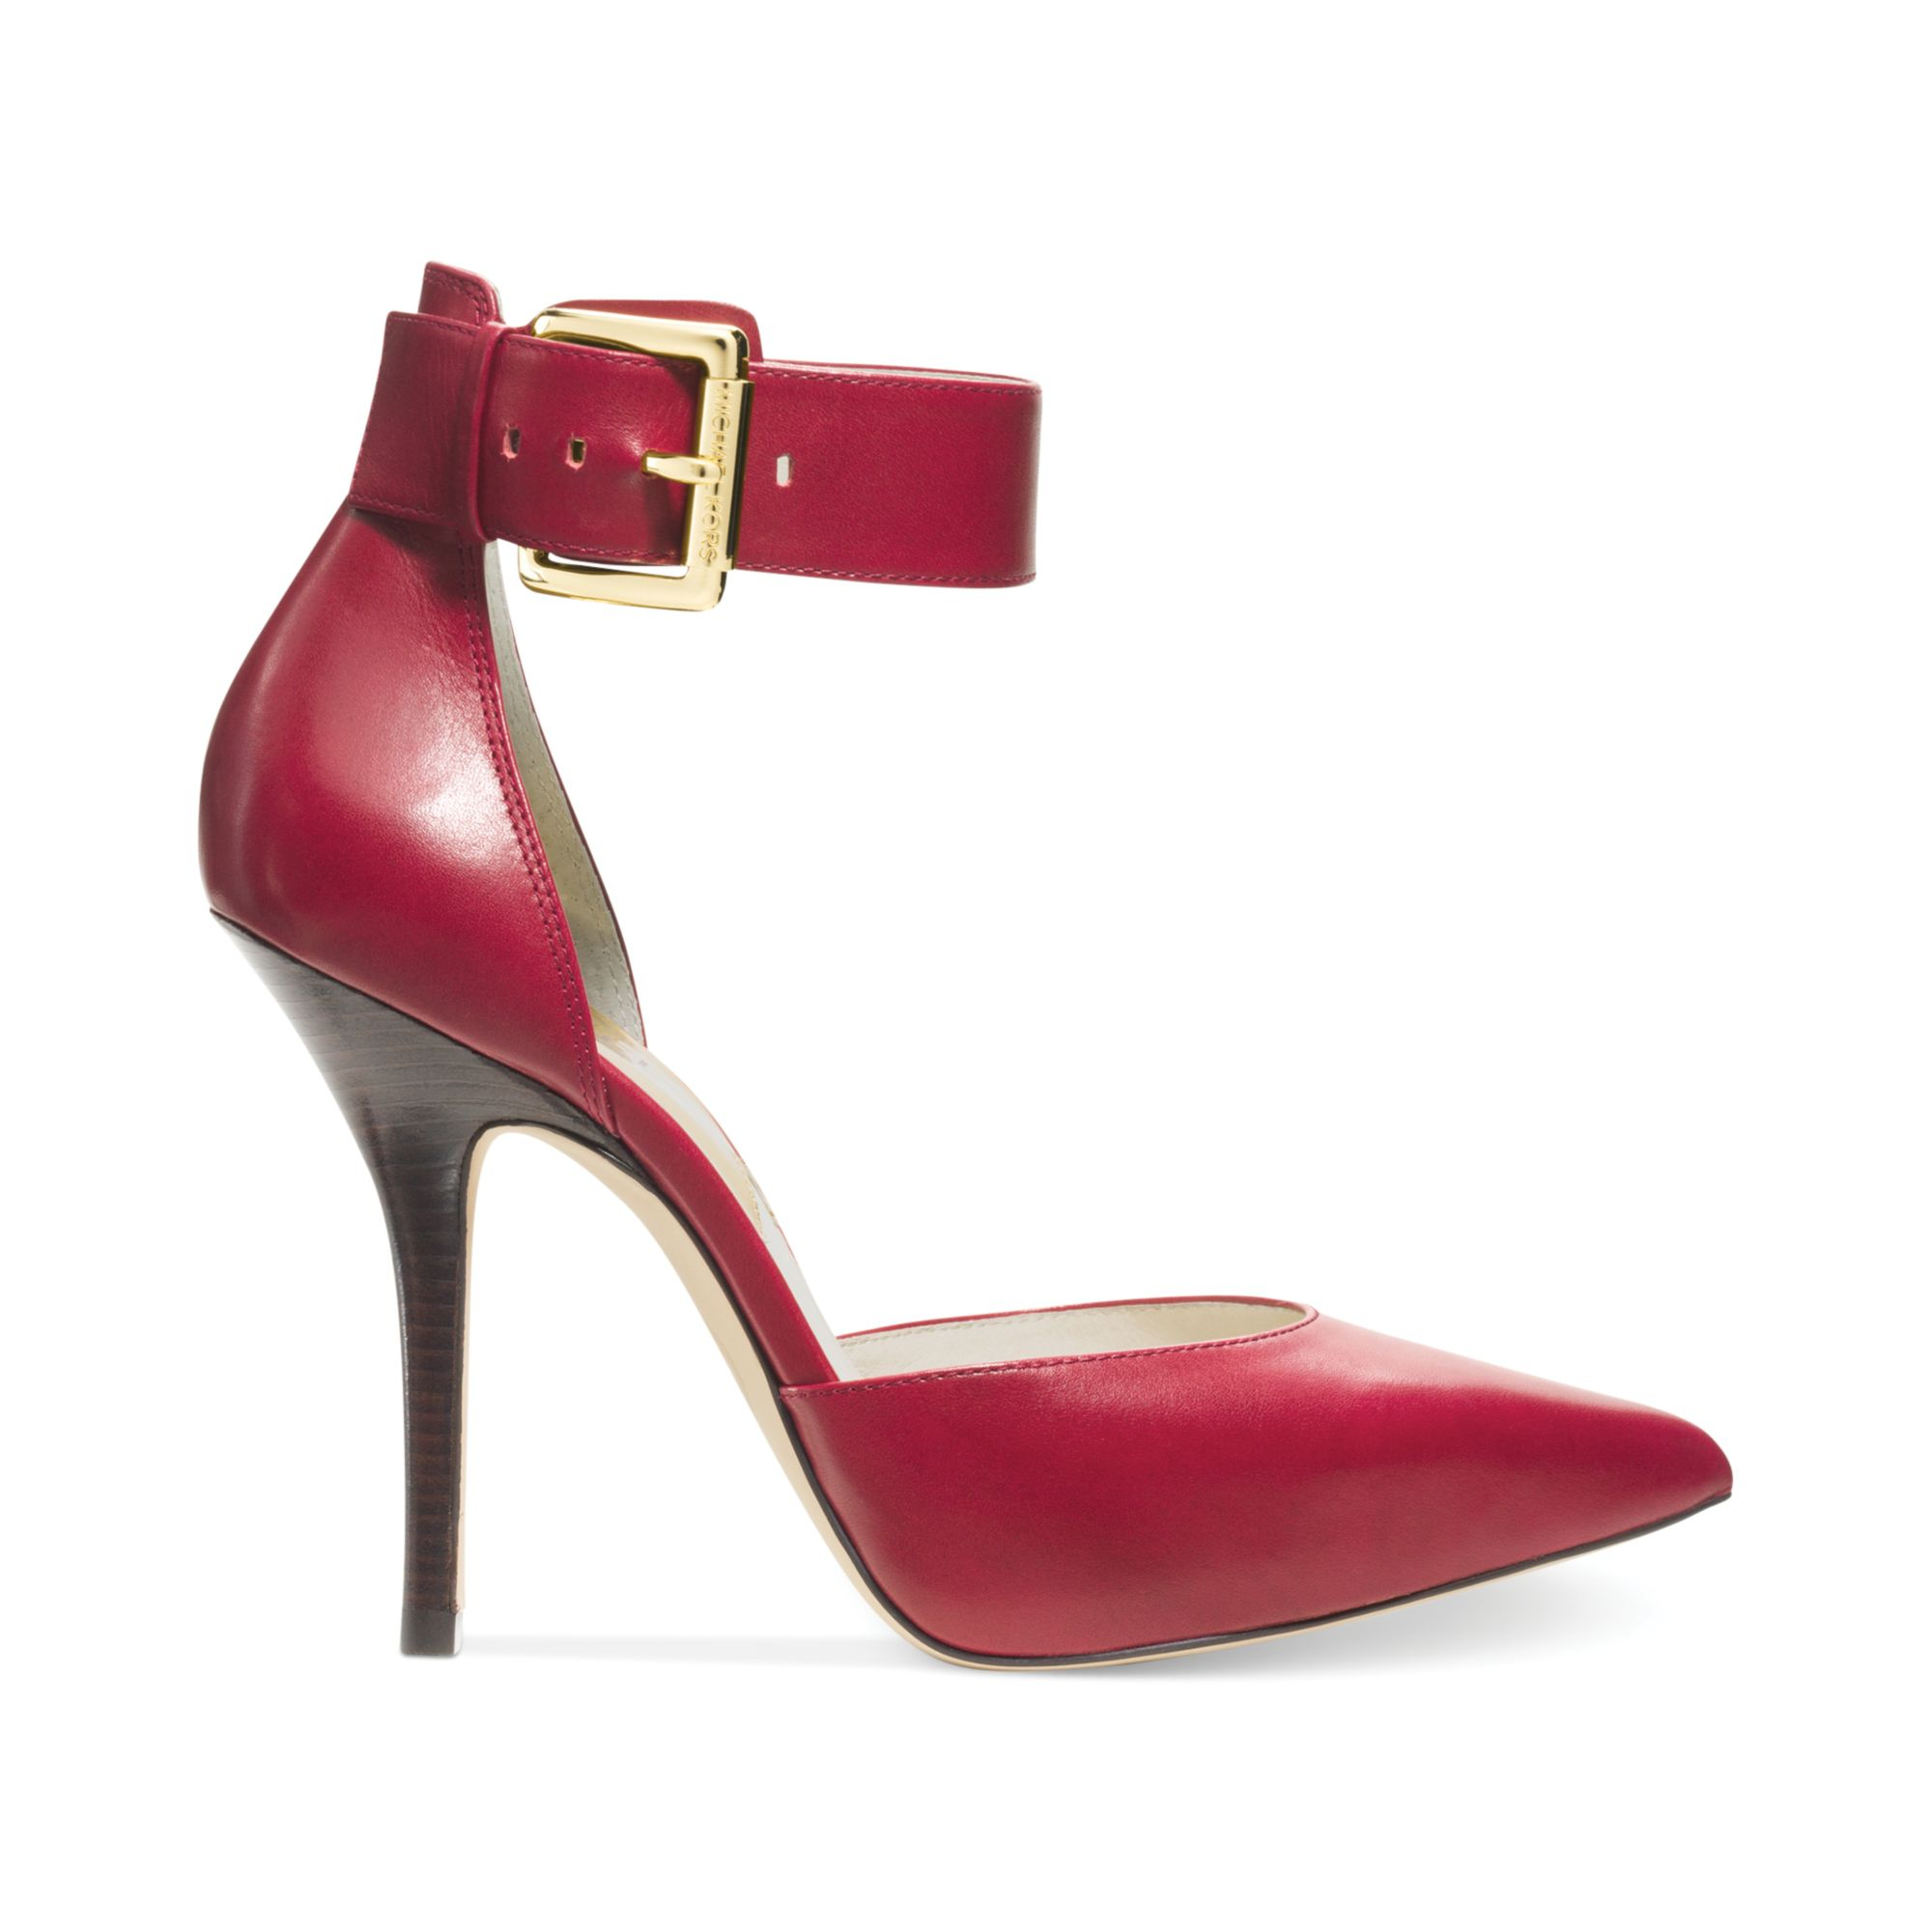 Lyst Michael Kors Michael Brinkley Ankle Strap Pumps In Red